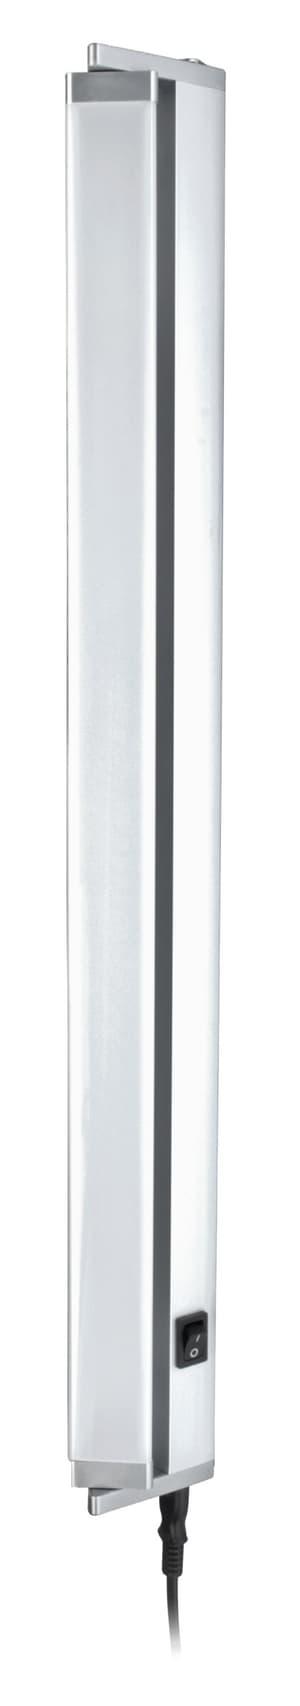 Lampada LED ad incasso 10,5 W, girevole